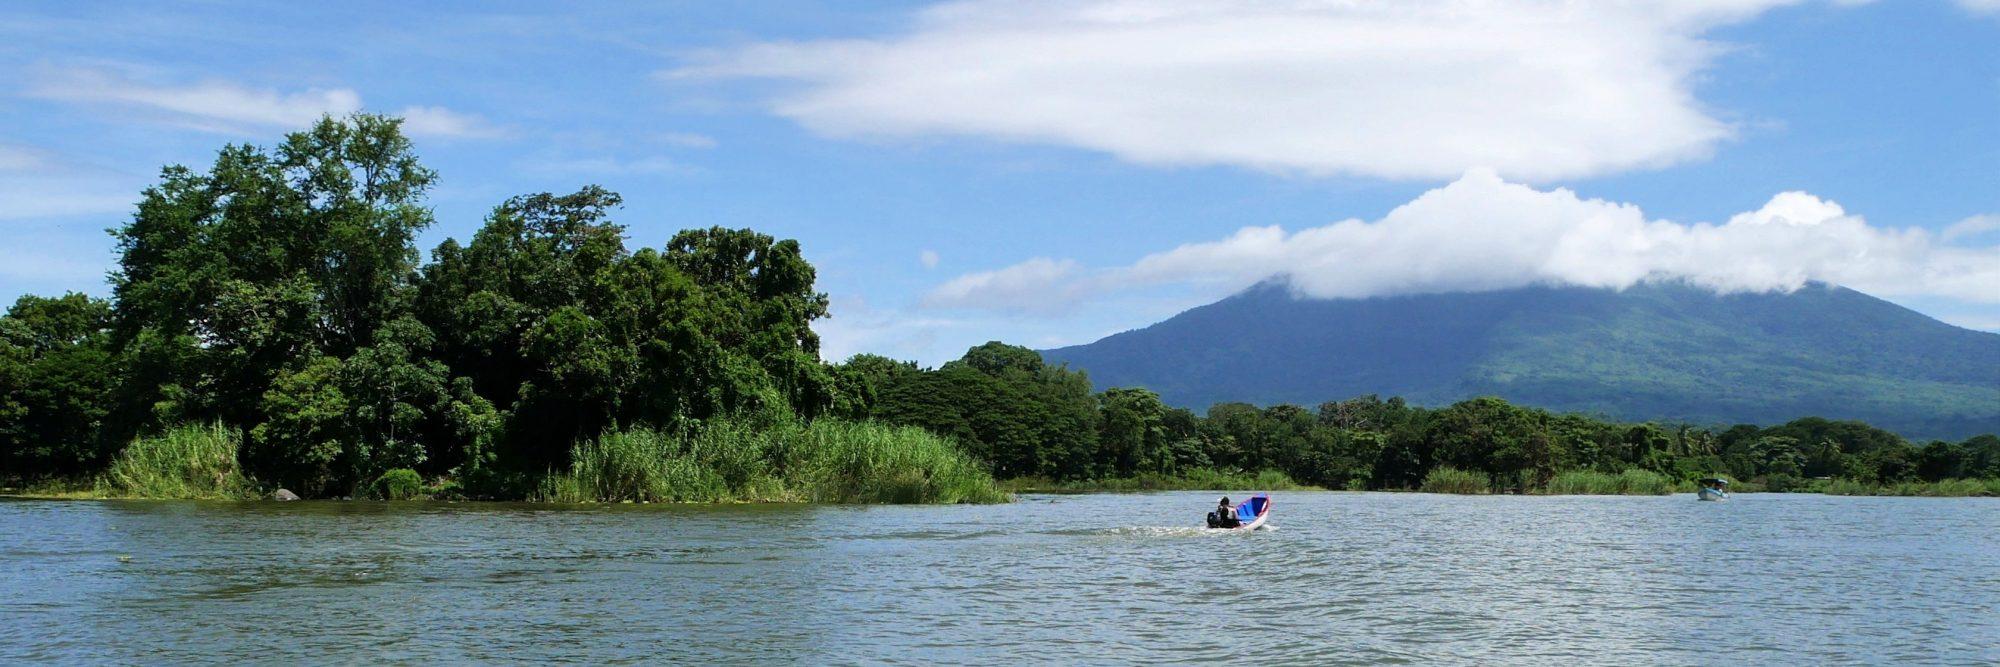 Nicaragaua Vulkan Mombacho Las Isletas by Birgit Strauch Shiatsu & Bewusstseinscoaching